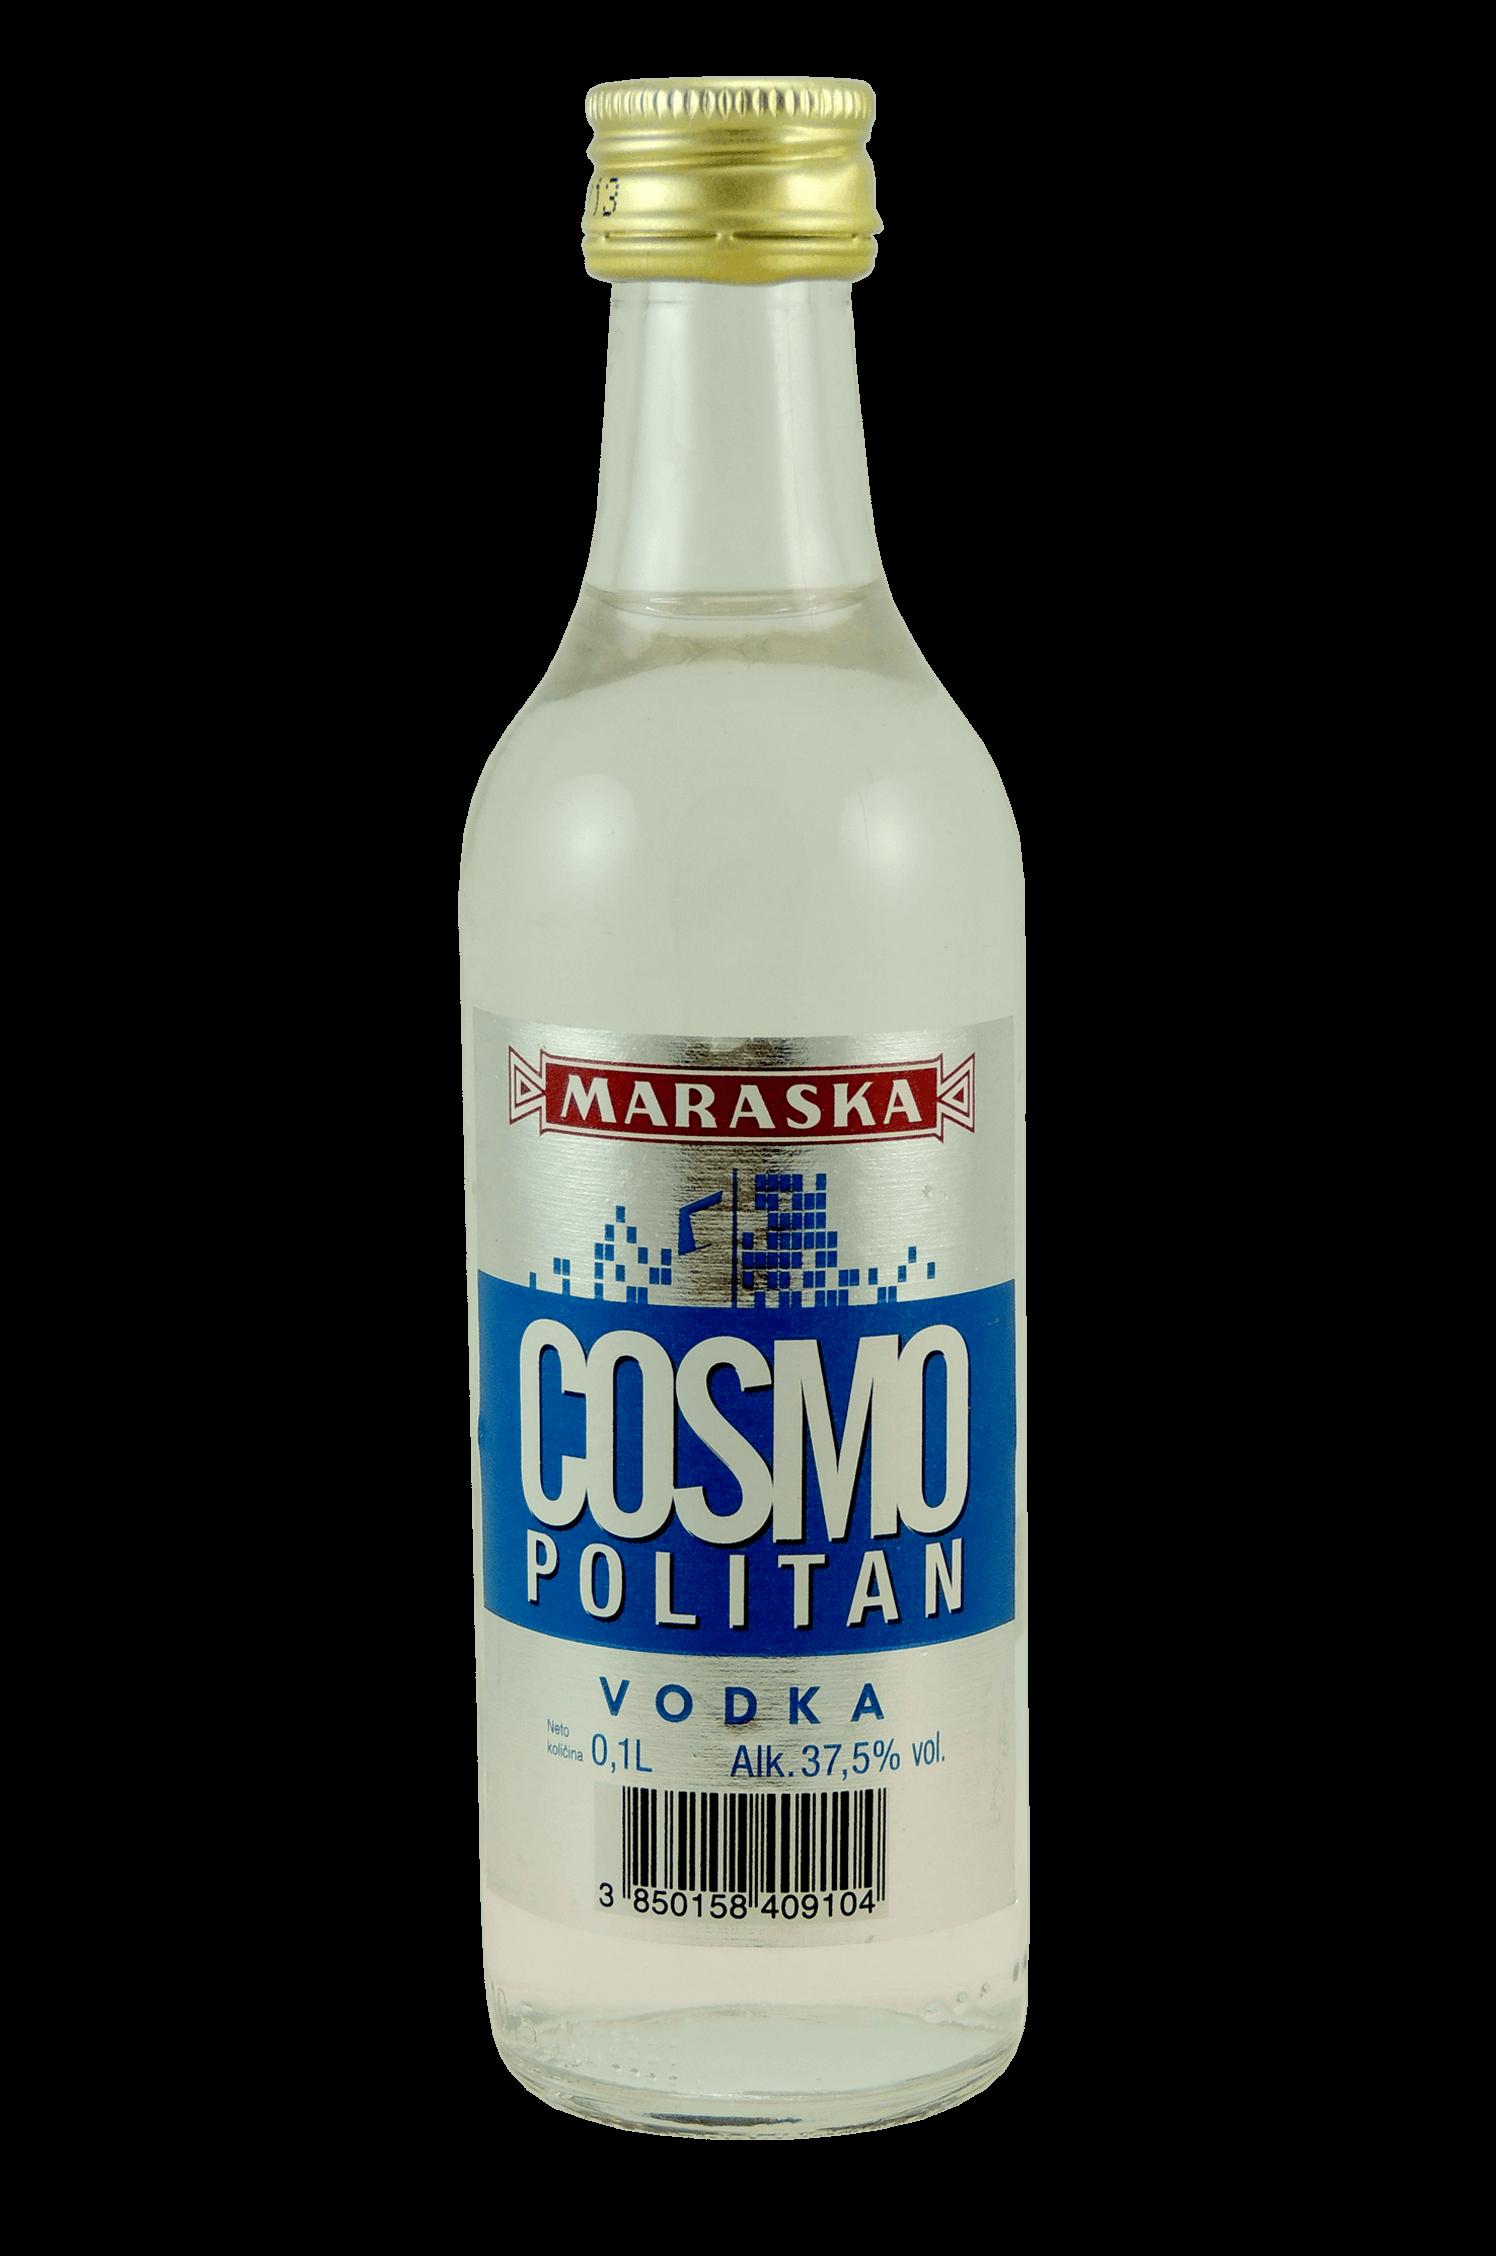 Cosmo Politan Vodka